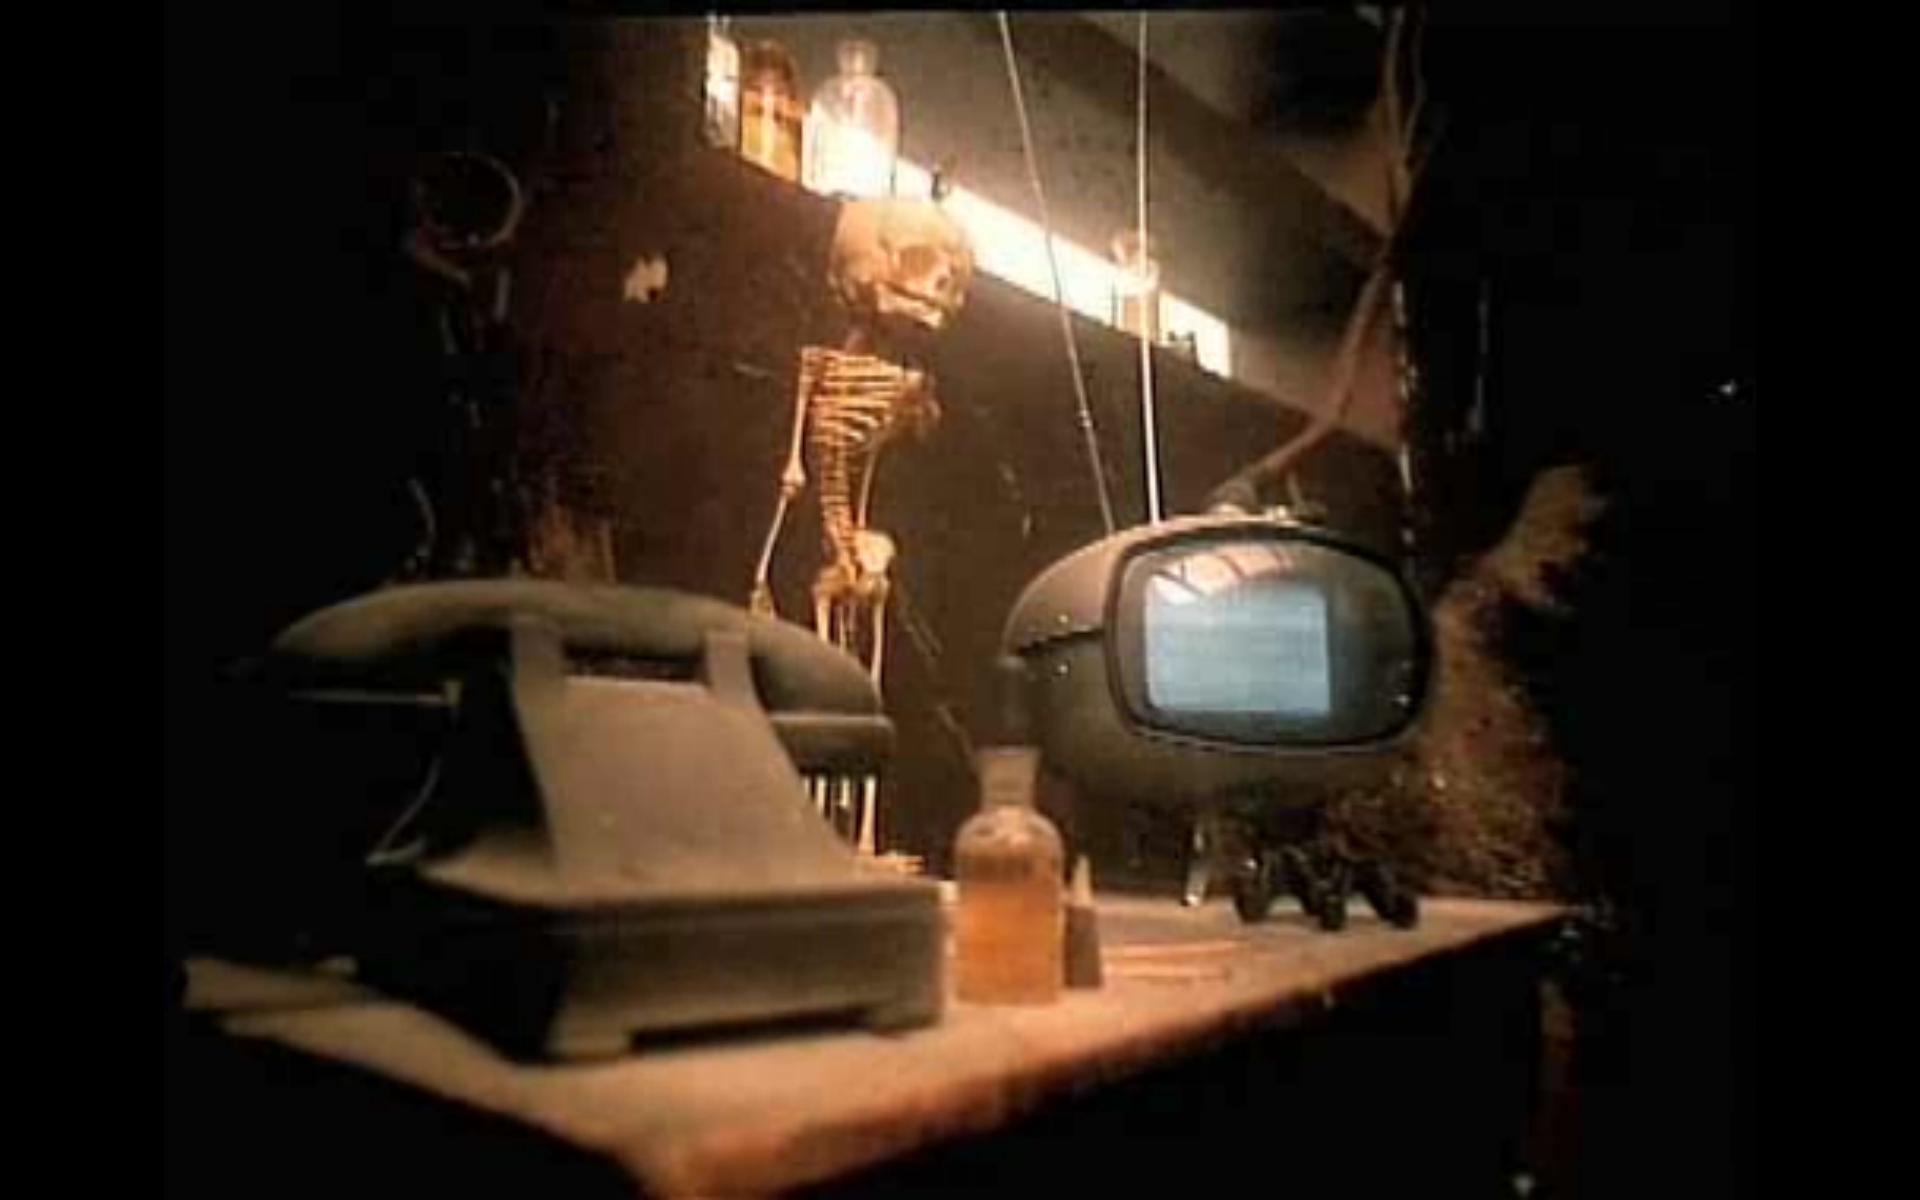 Nine Inch Nails, Closer (music video) 1994. #Cinematography #photography #music #musicvideo #nineinchnails  #flim #reznor #decor #design